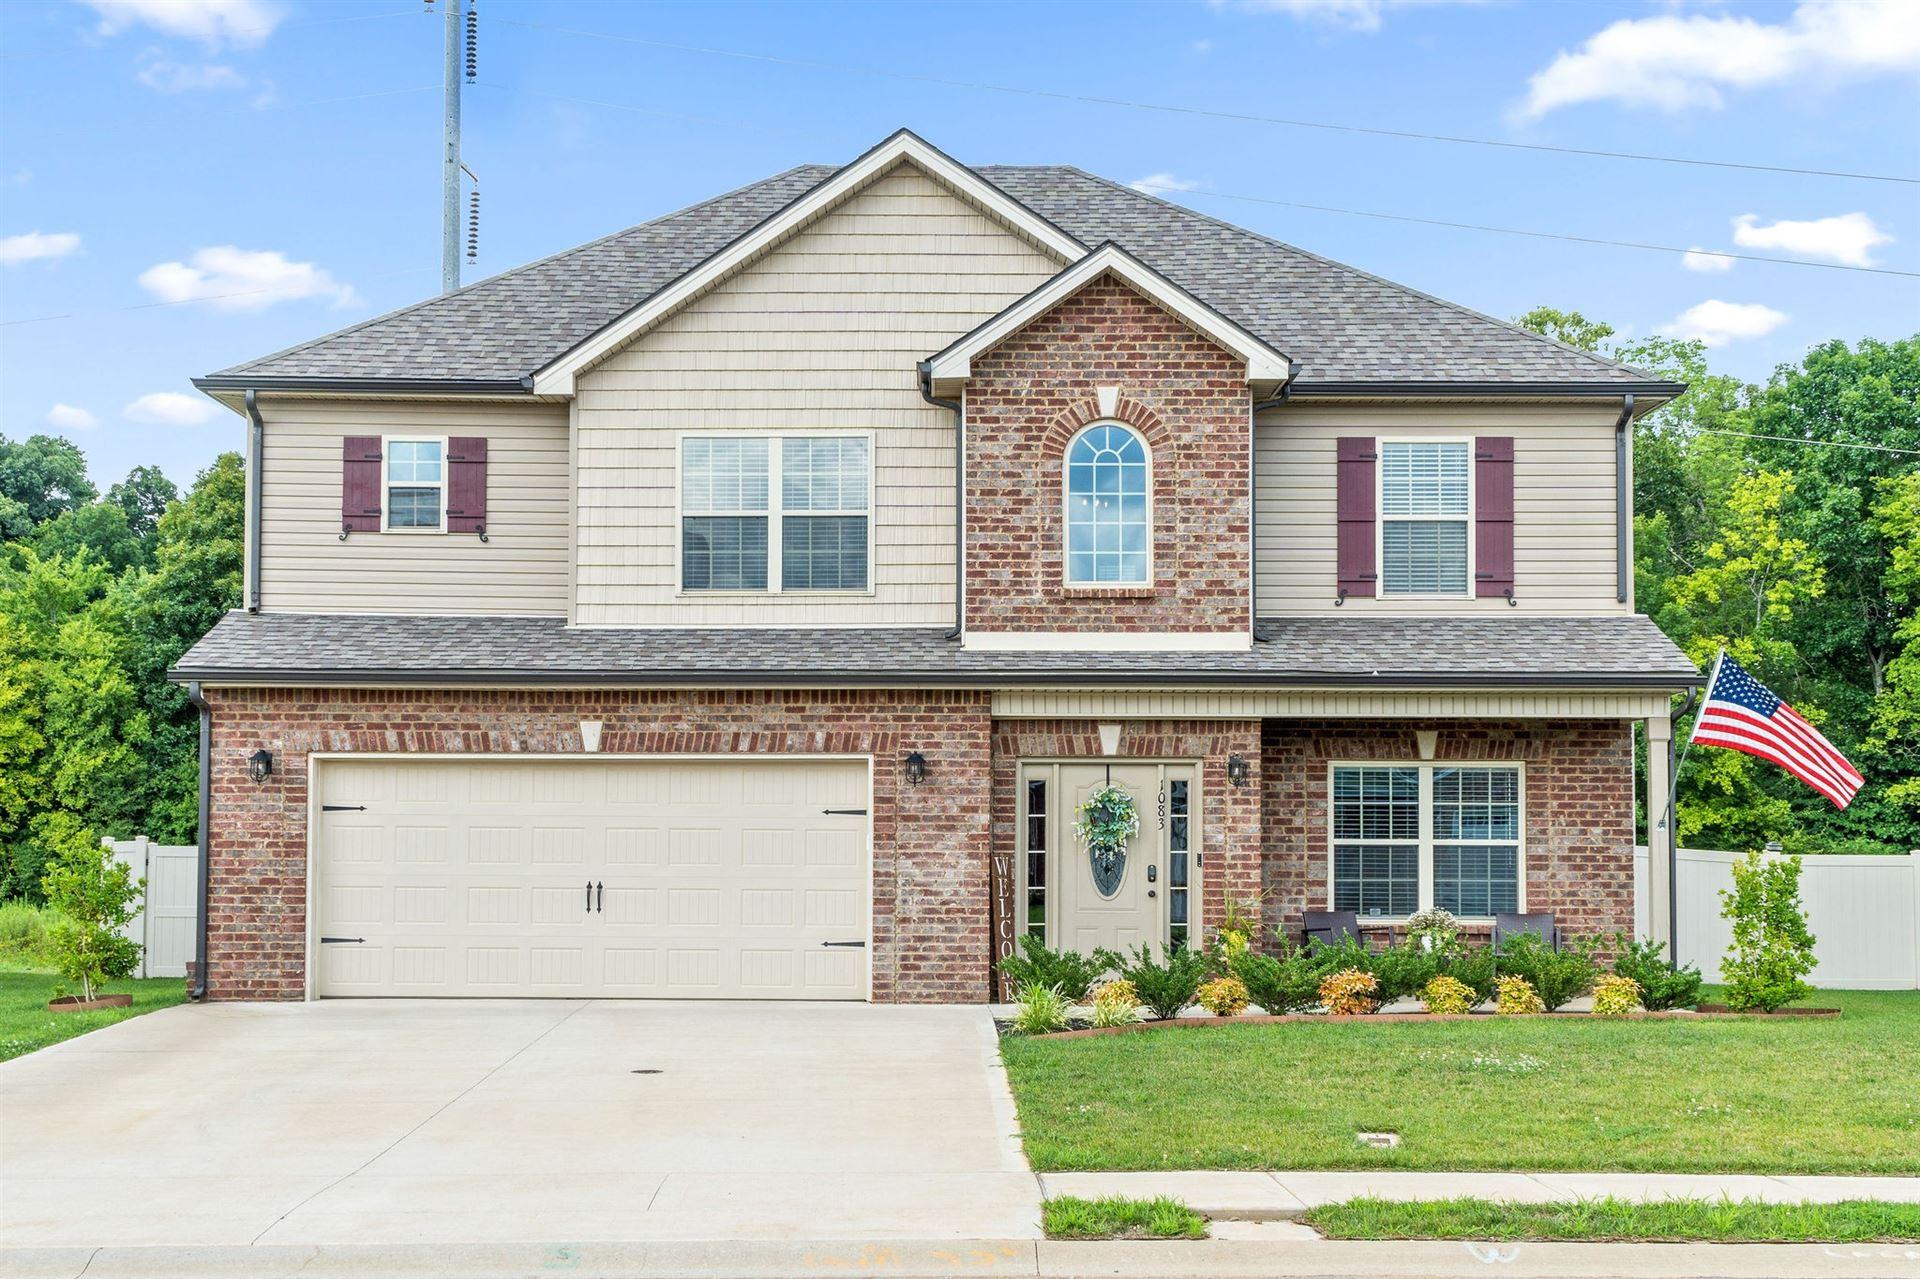 1083 Terraceside Cir, Clarksville, TN 37040 - MLS#: 2273278